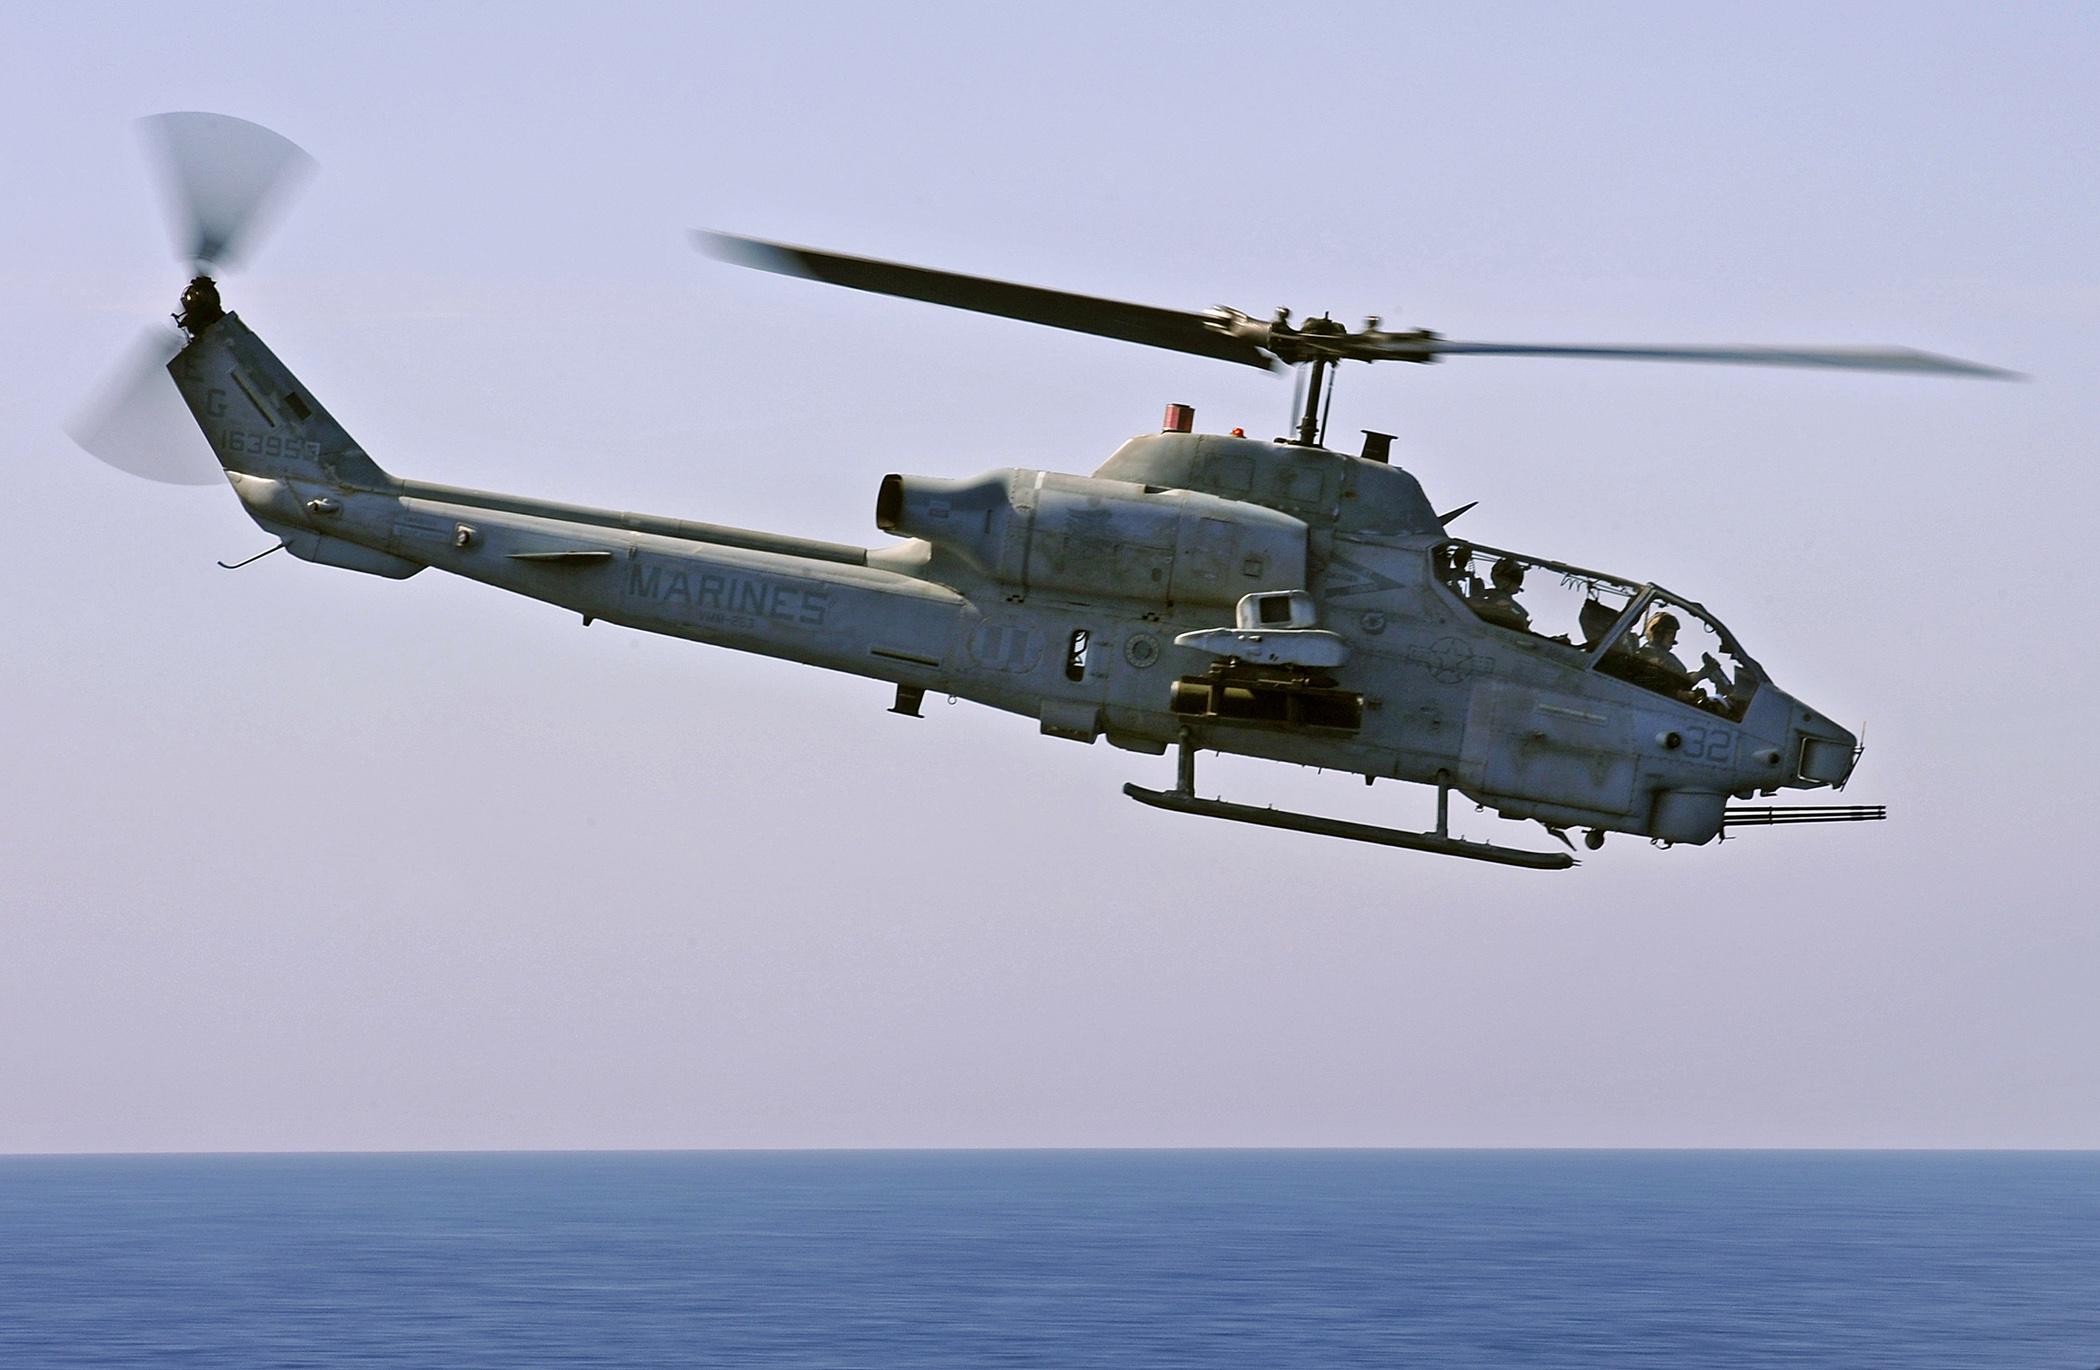 File:AH-1W Cobra over water.jpg